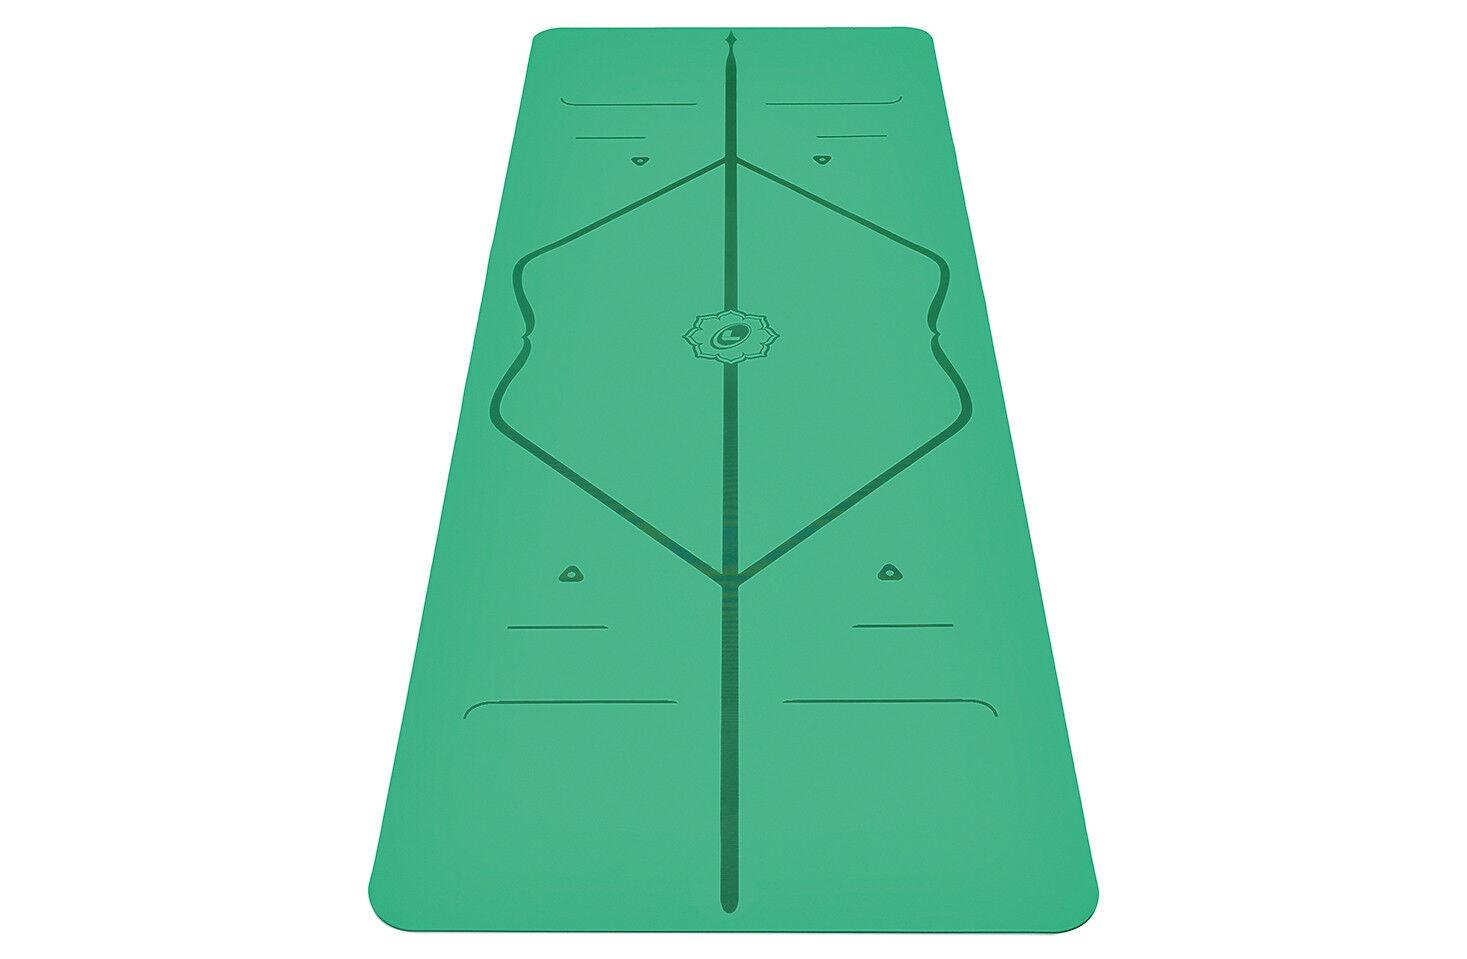 Liforme The YOGA Mat - verde -The World's Best Eco-Friendly, Non Slip Yoga Mat